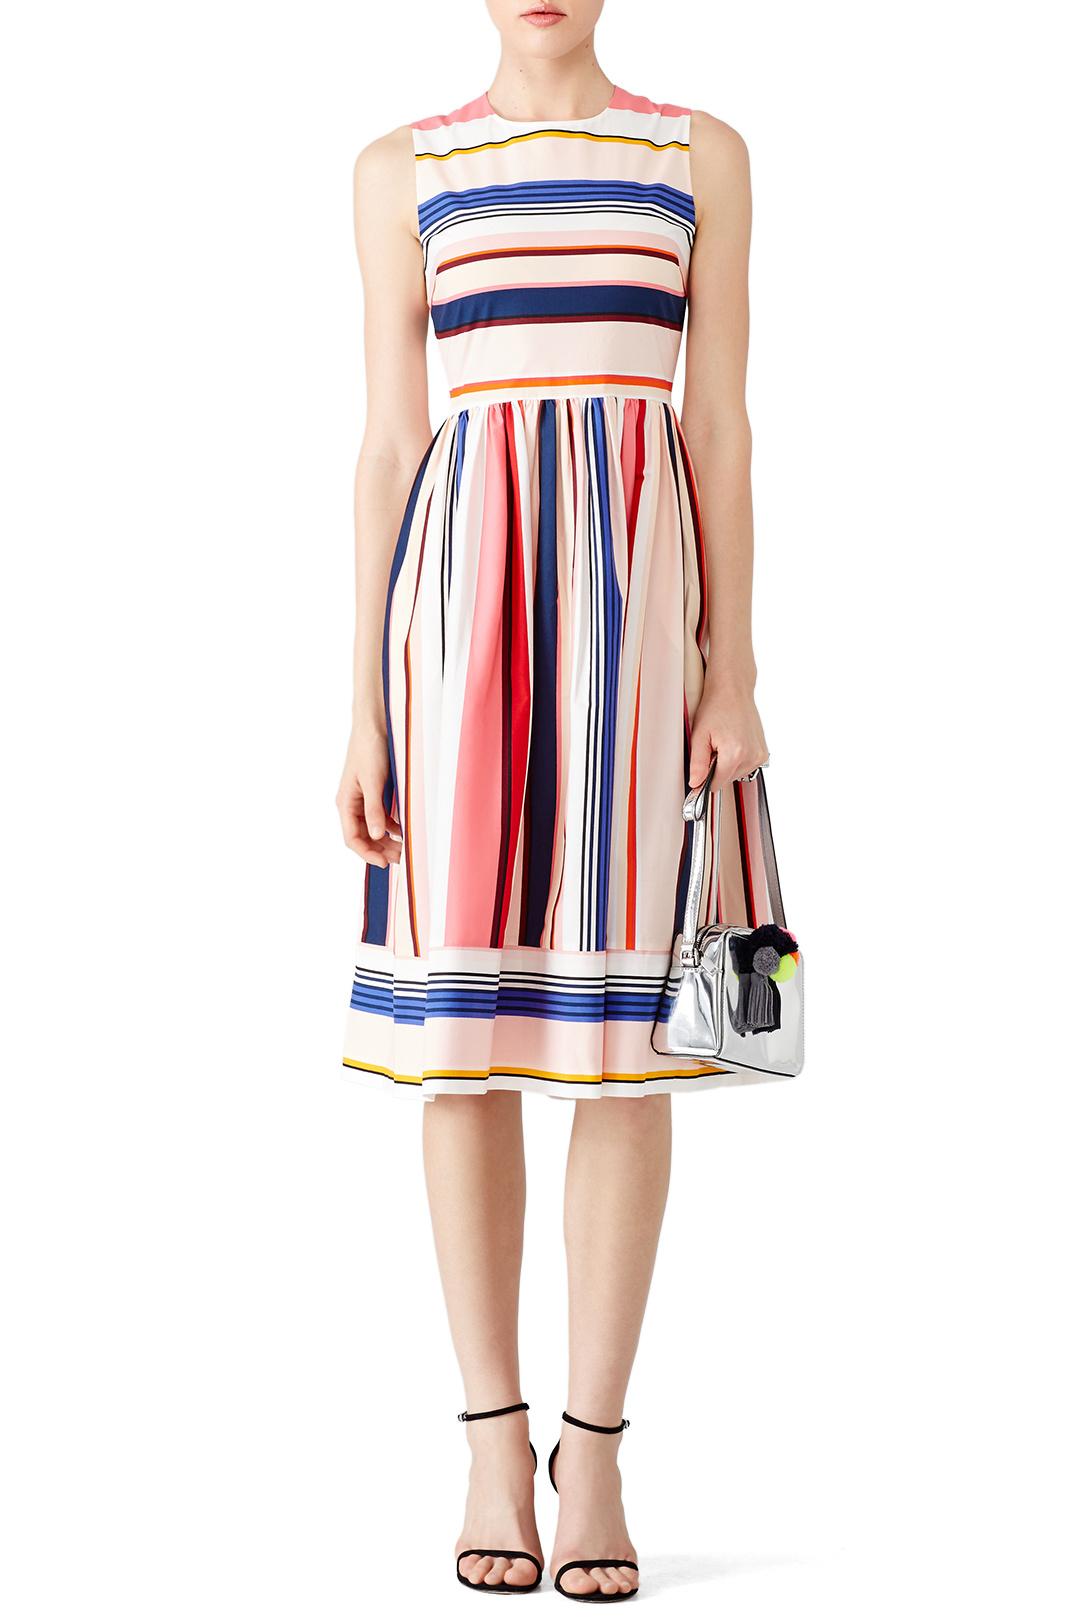 Kate Spade Striped Berber Dress